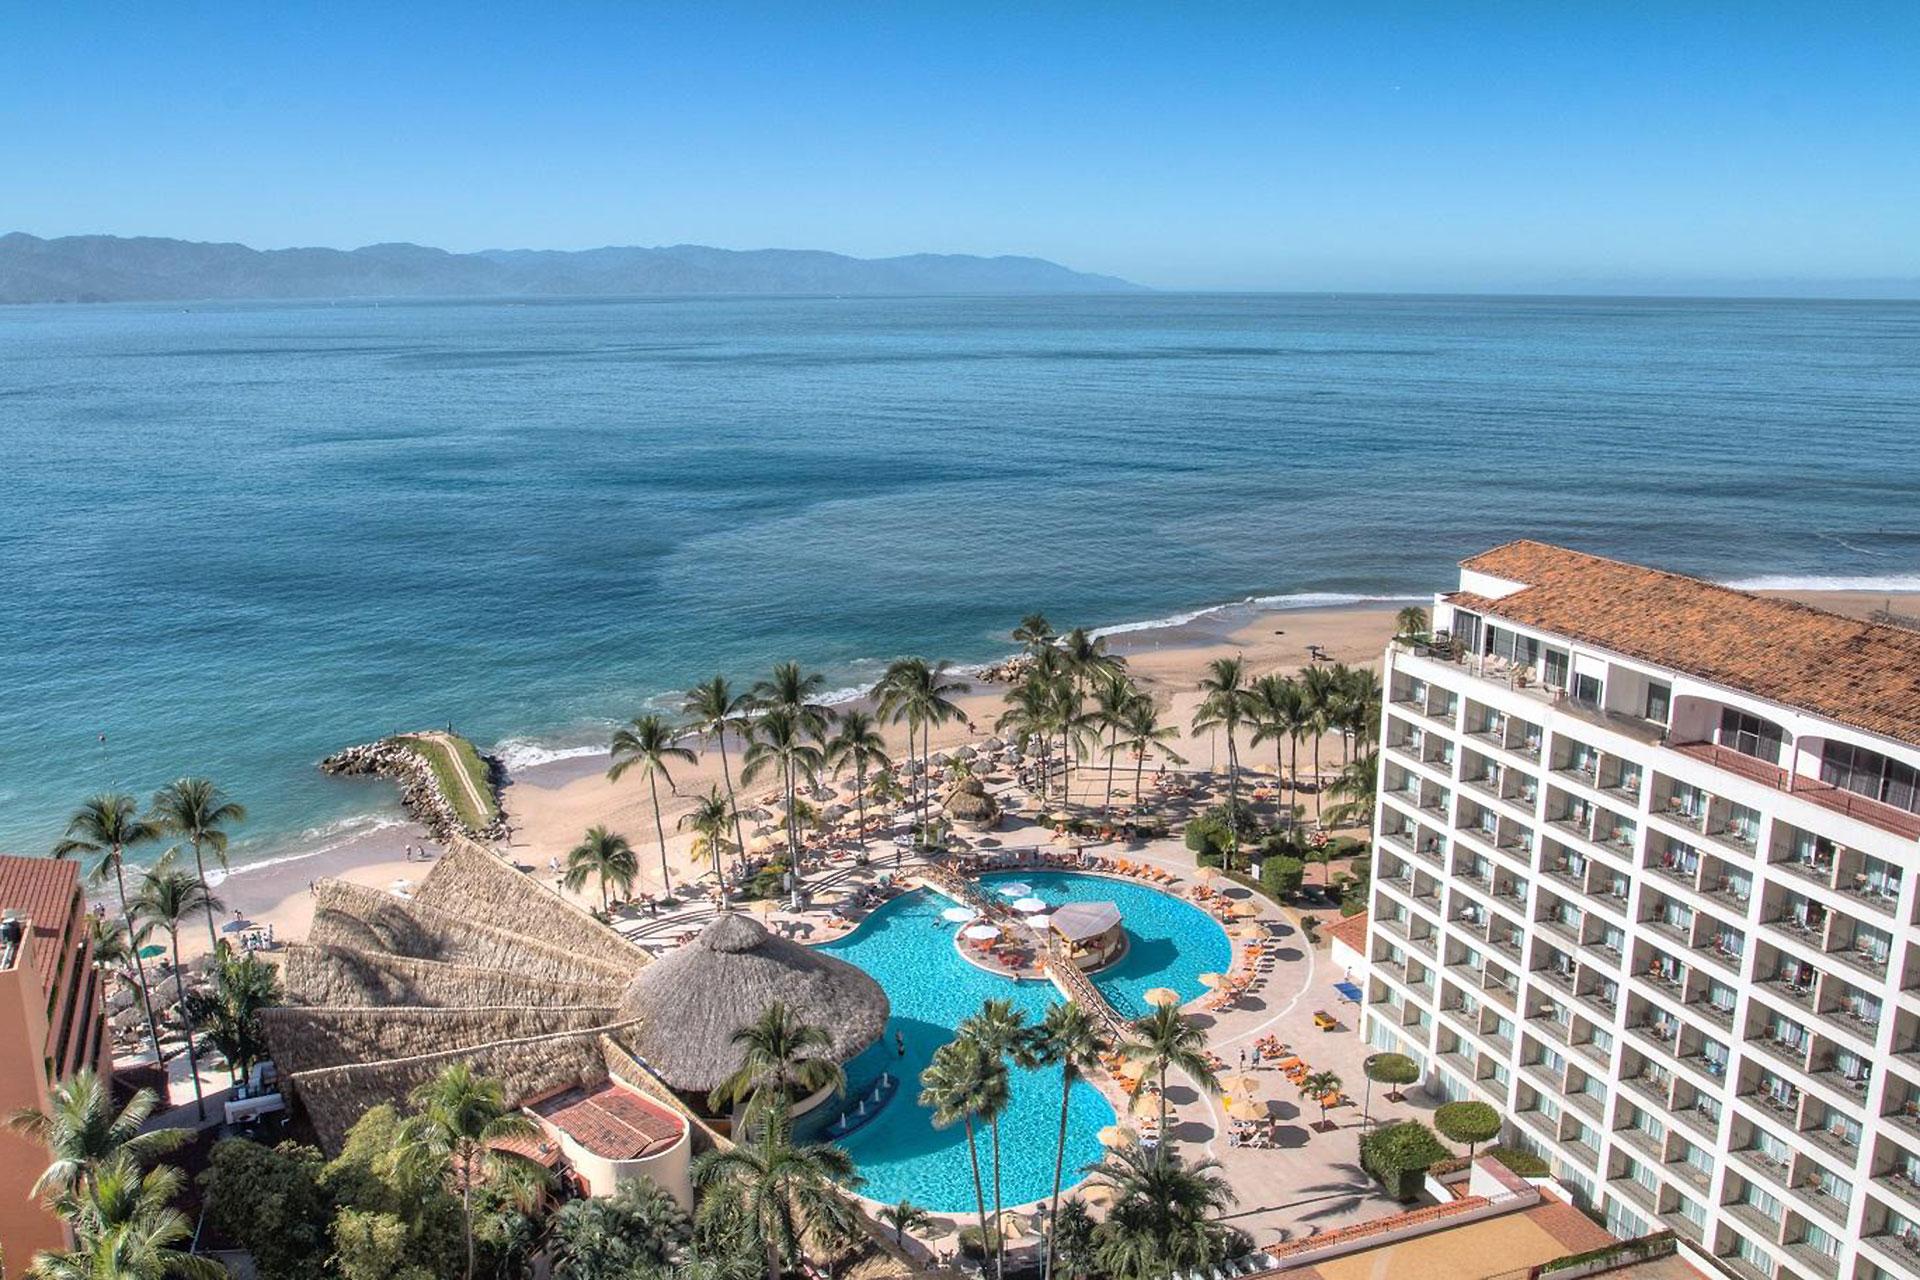 Aerial View of Sunscape Puerto Vallarta Resort and Spa in Puerto Vallarta, Mexico